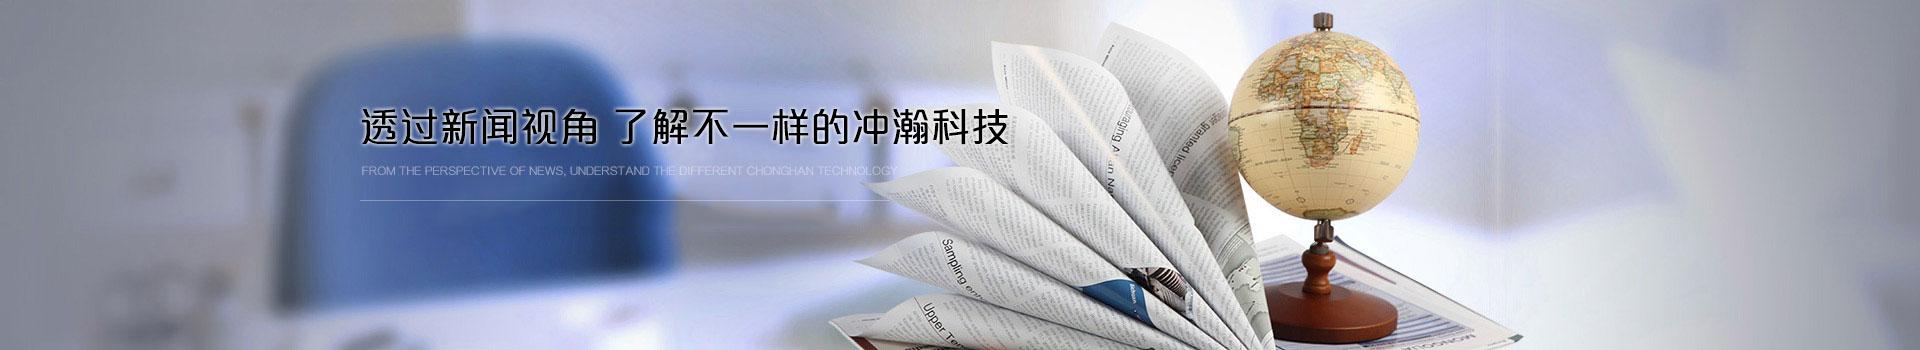 tou过视角 了解bu一yang的九zhouwang科技